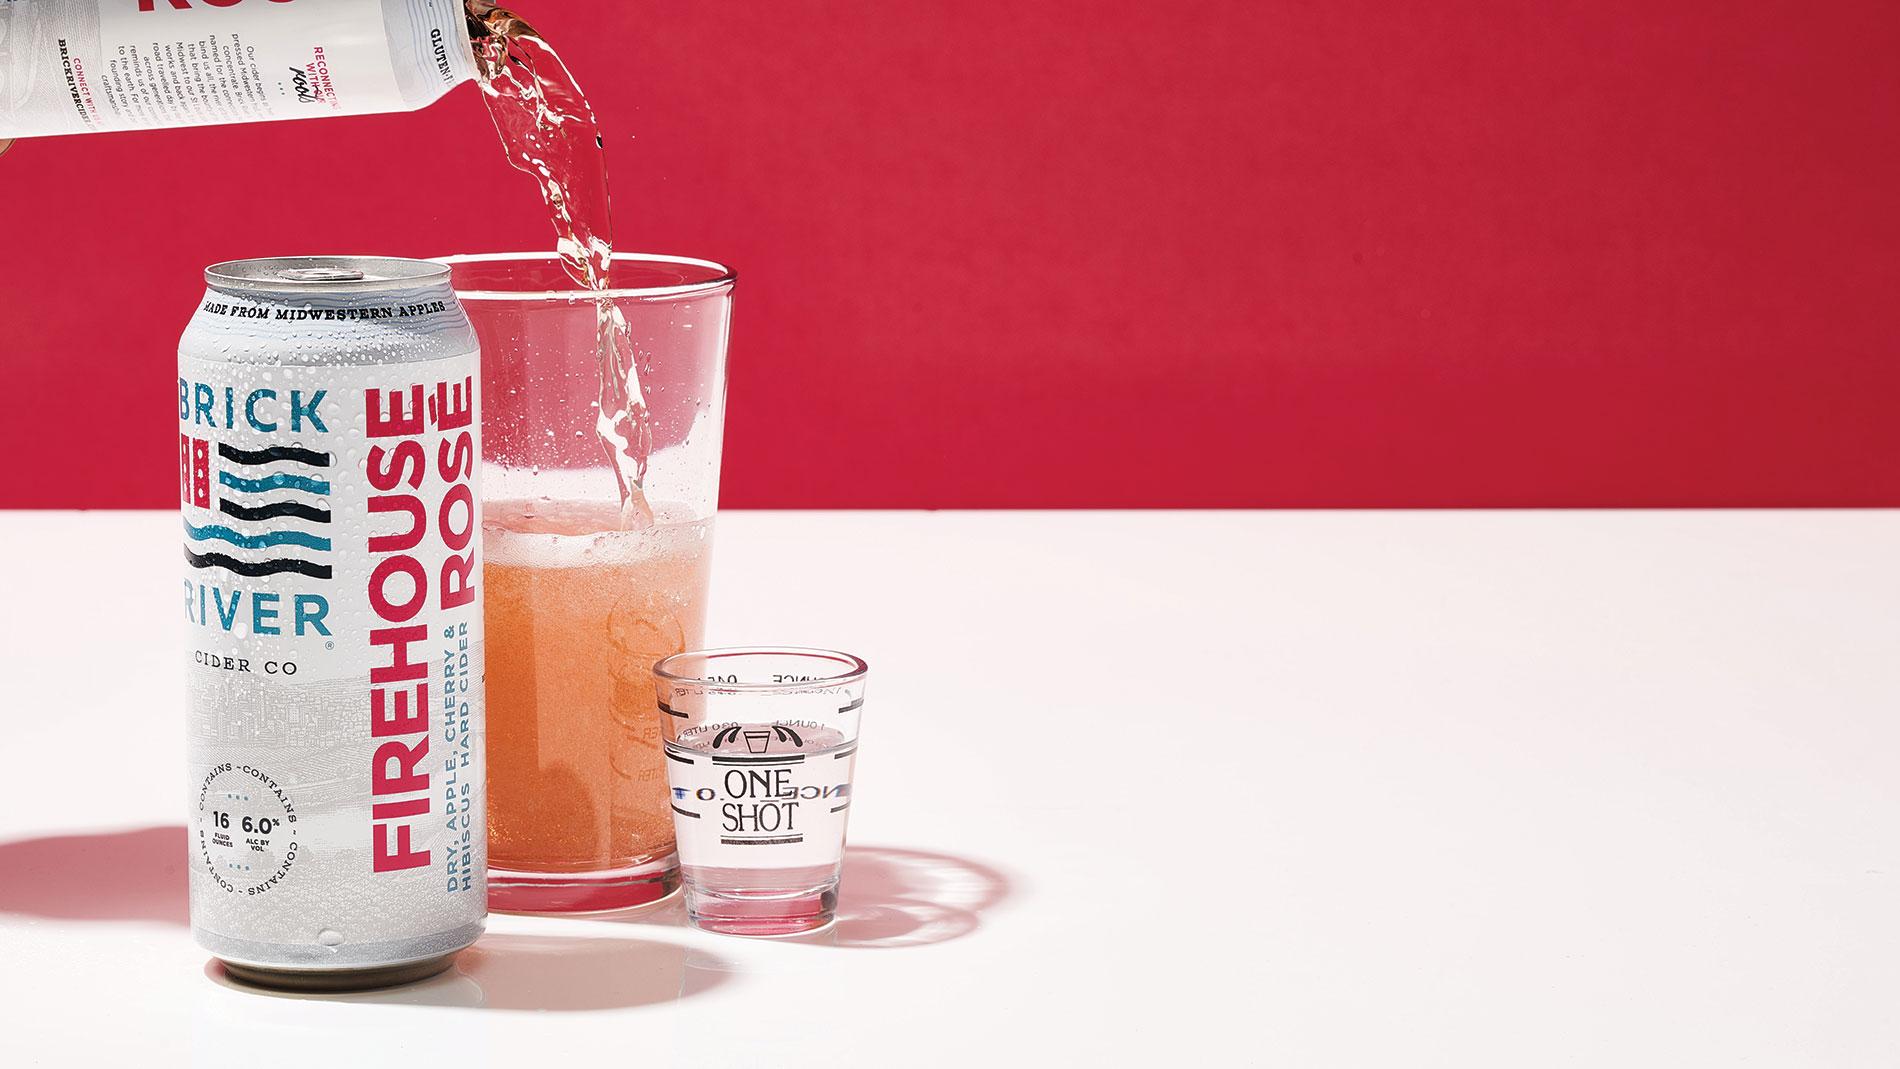 Brick River Cider Co. Firehouse Rose + Pinckney Bend Distillery Handcrafted Gin